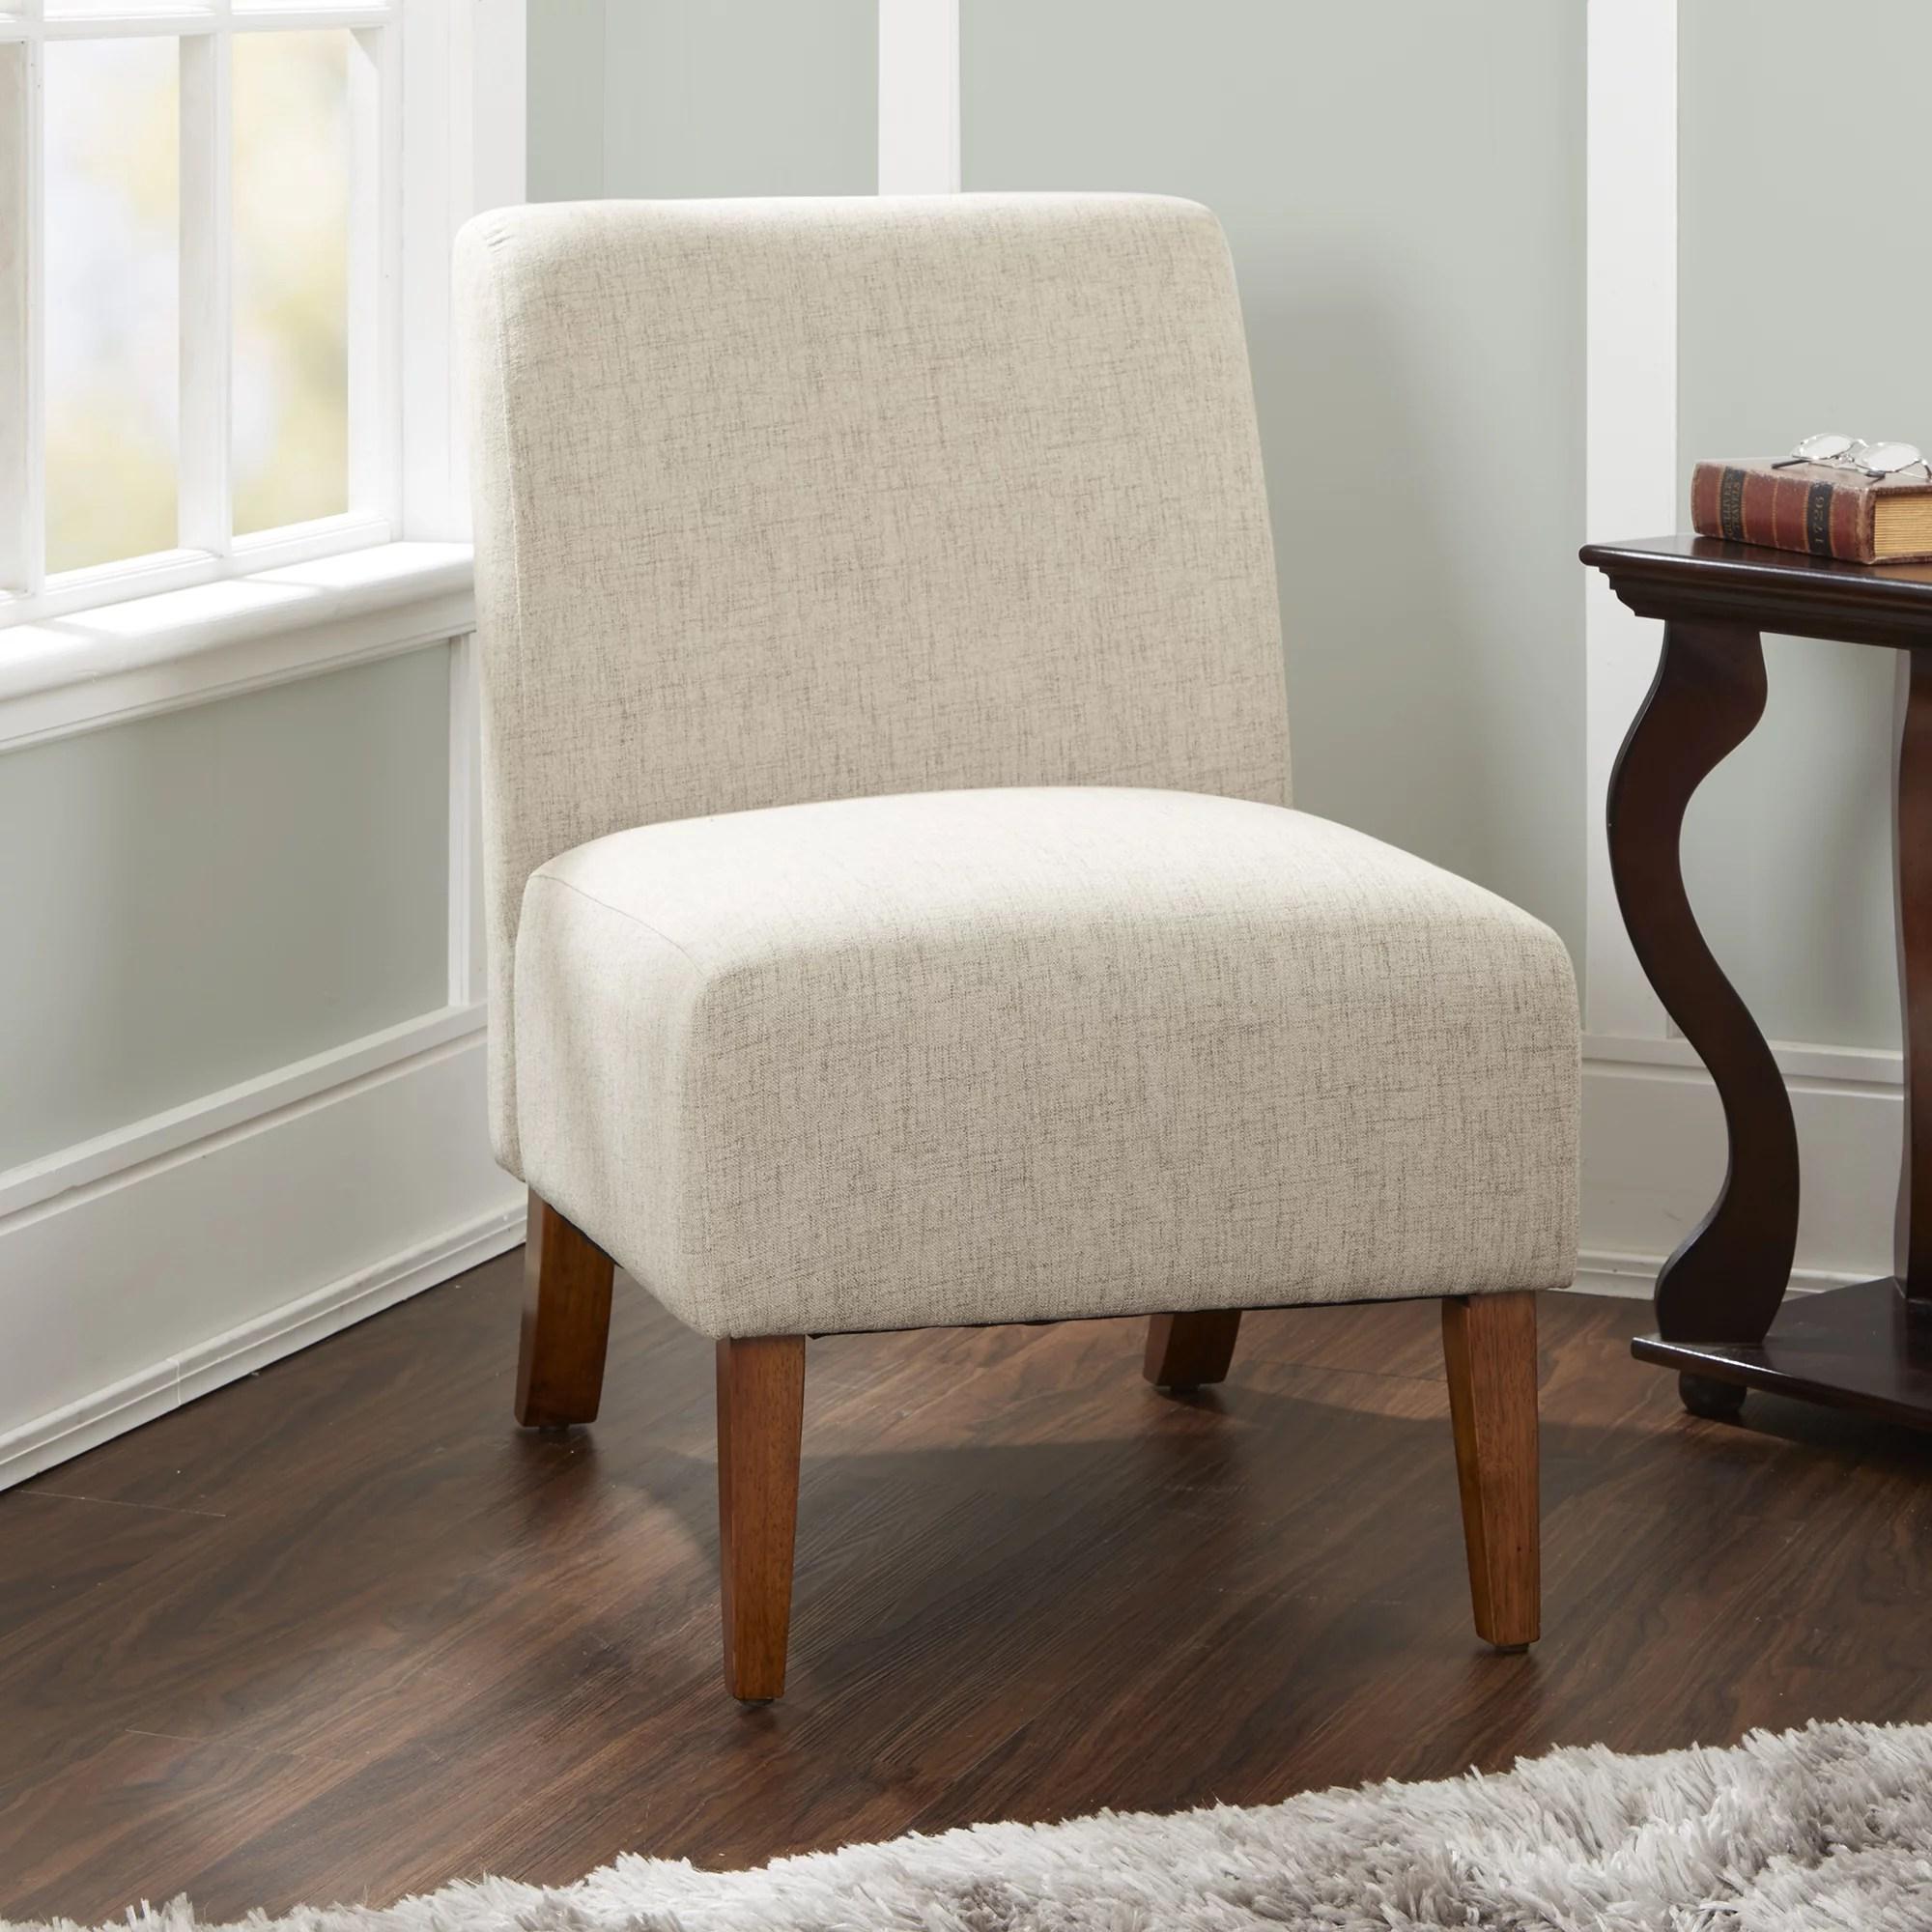 upholstered slipper chair black oversized silverwood addison in tan walmart com